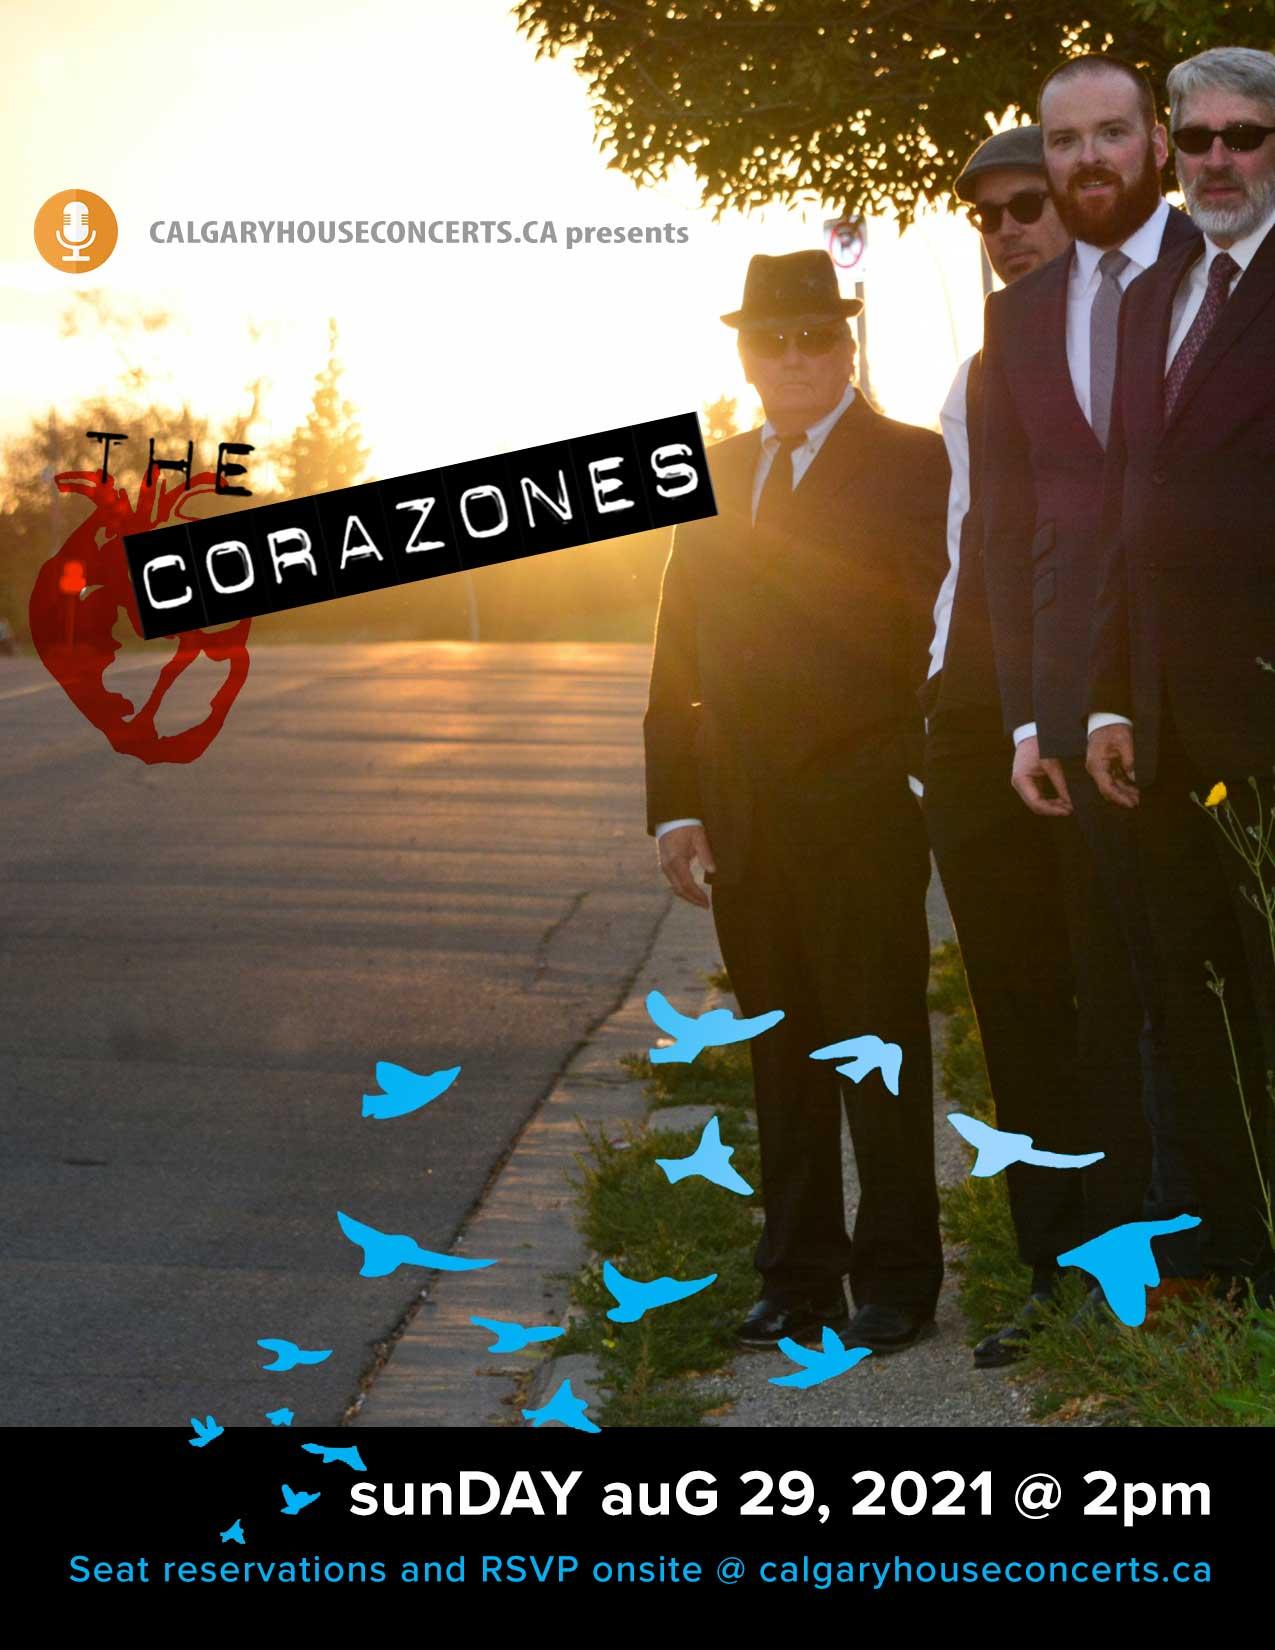 Das Corazones (The Corazones)